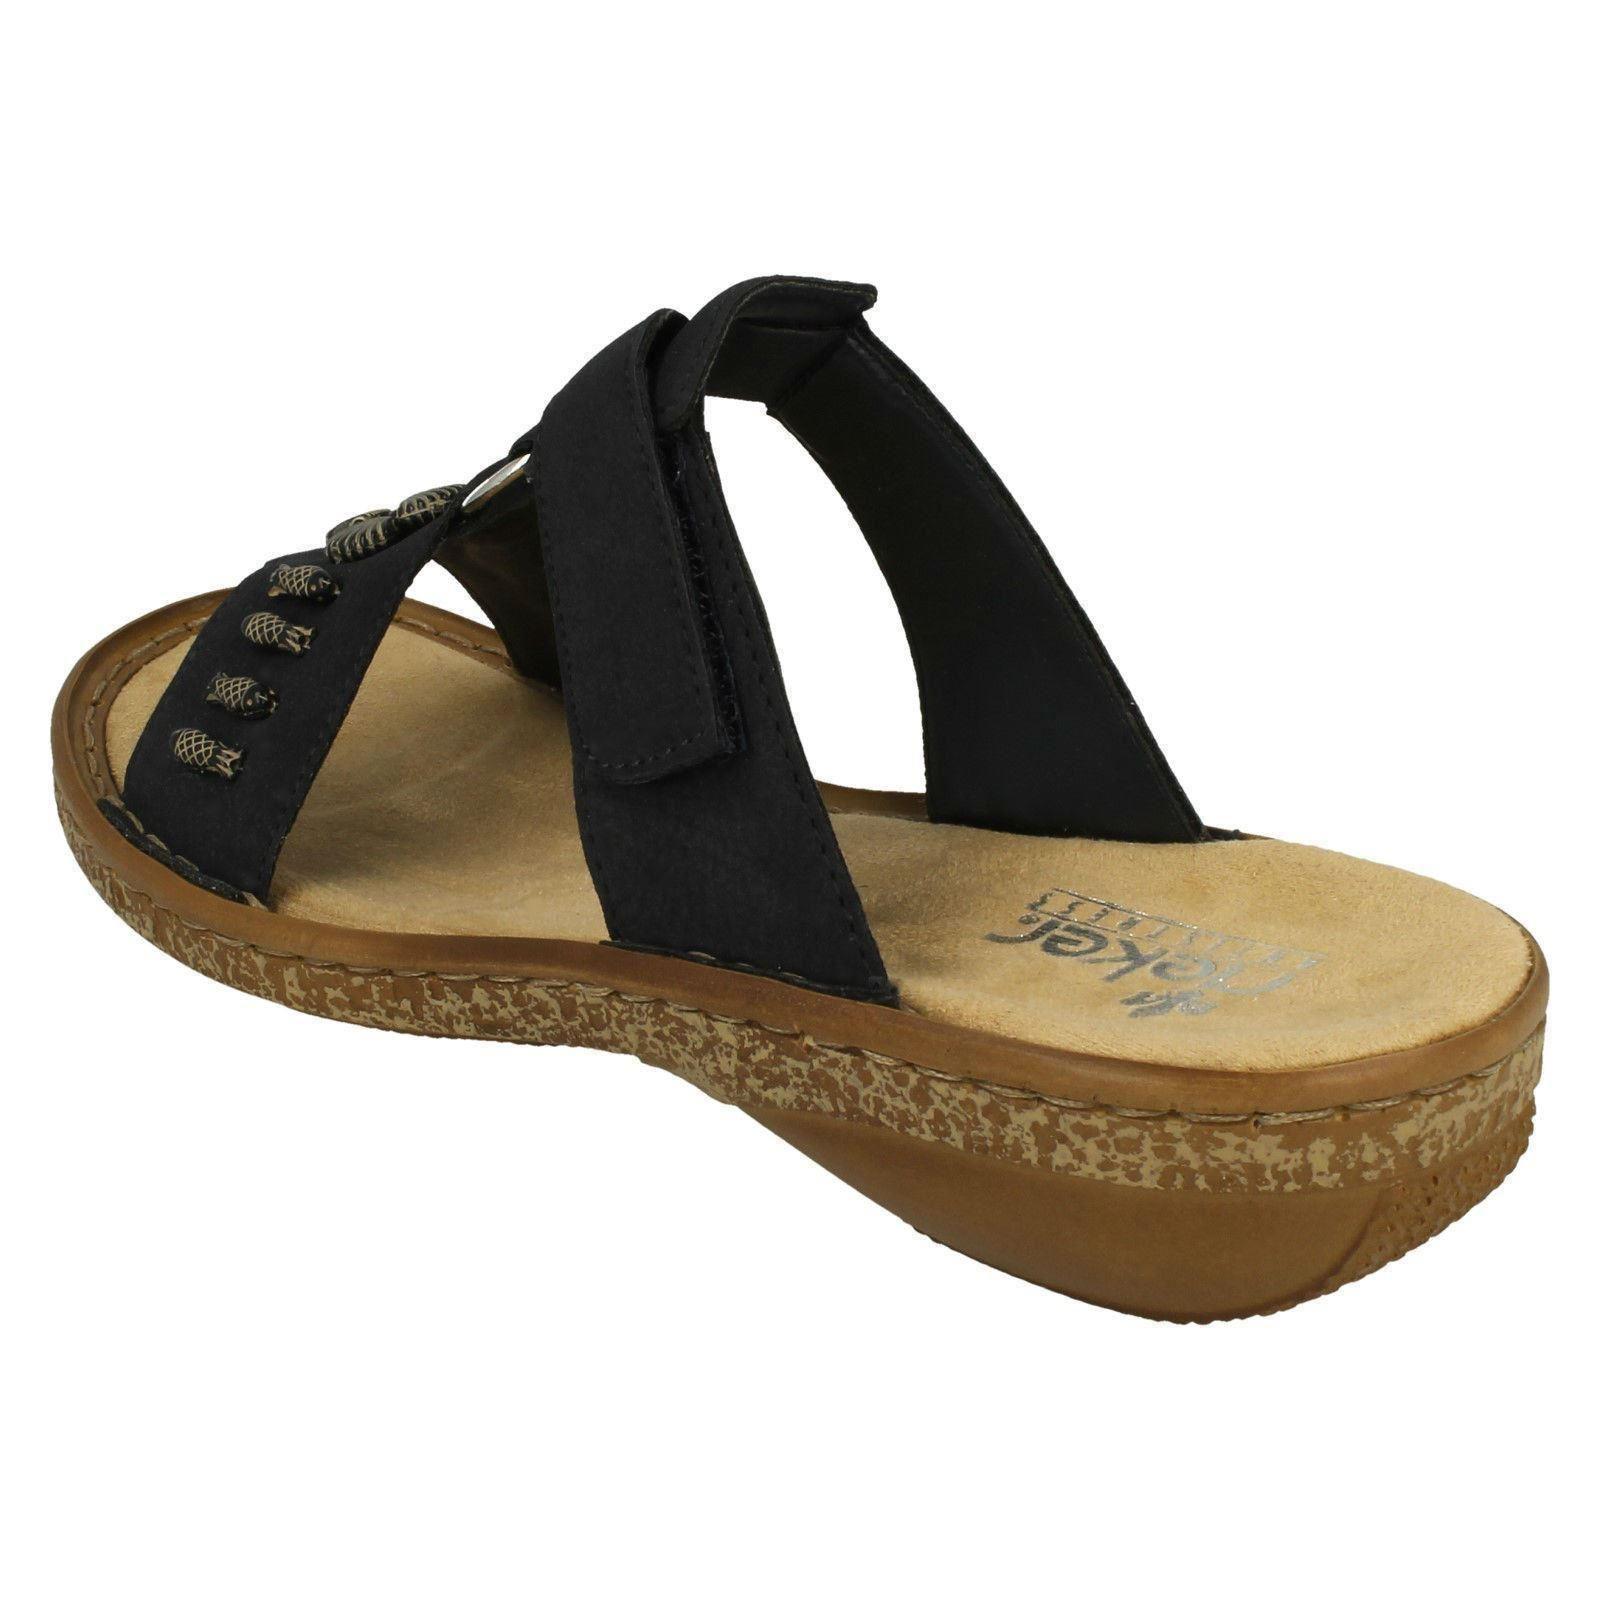 damen damen damen Rieker Open Toe Sandals - 62891  | Qualifizierte Herstellung  44f2e3